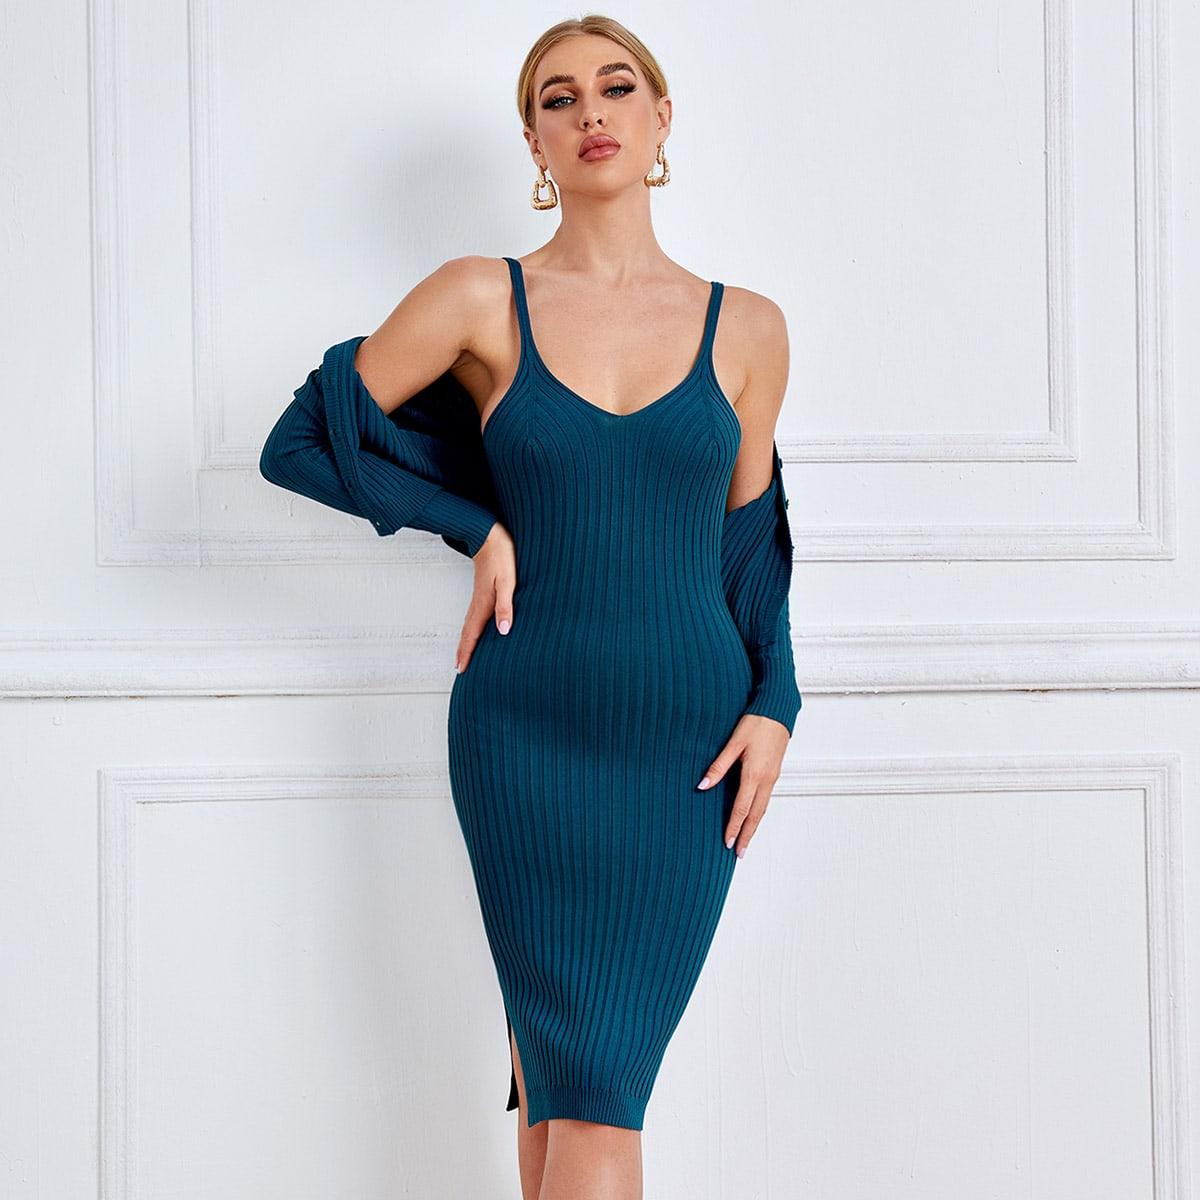 shein Elegant Vlak Gebreide jurk Split